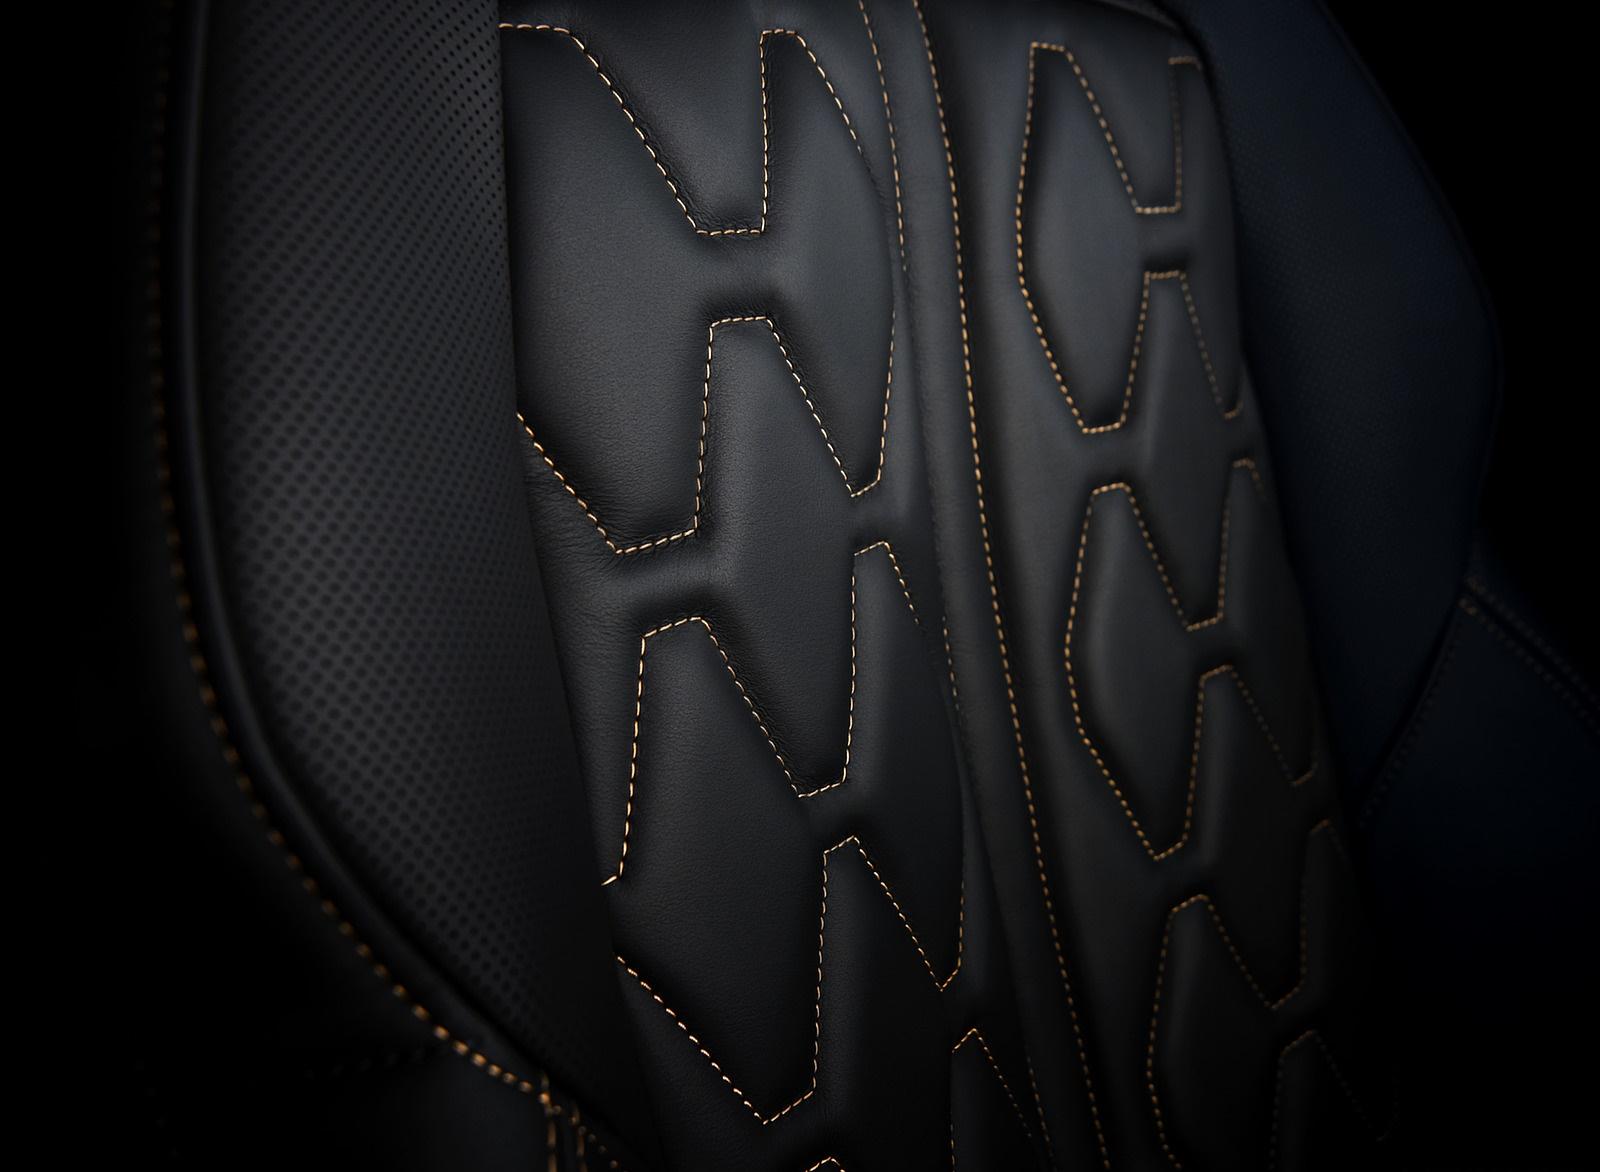 2019 Peugeot 508 Interior Seats Wallpapers (4)